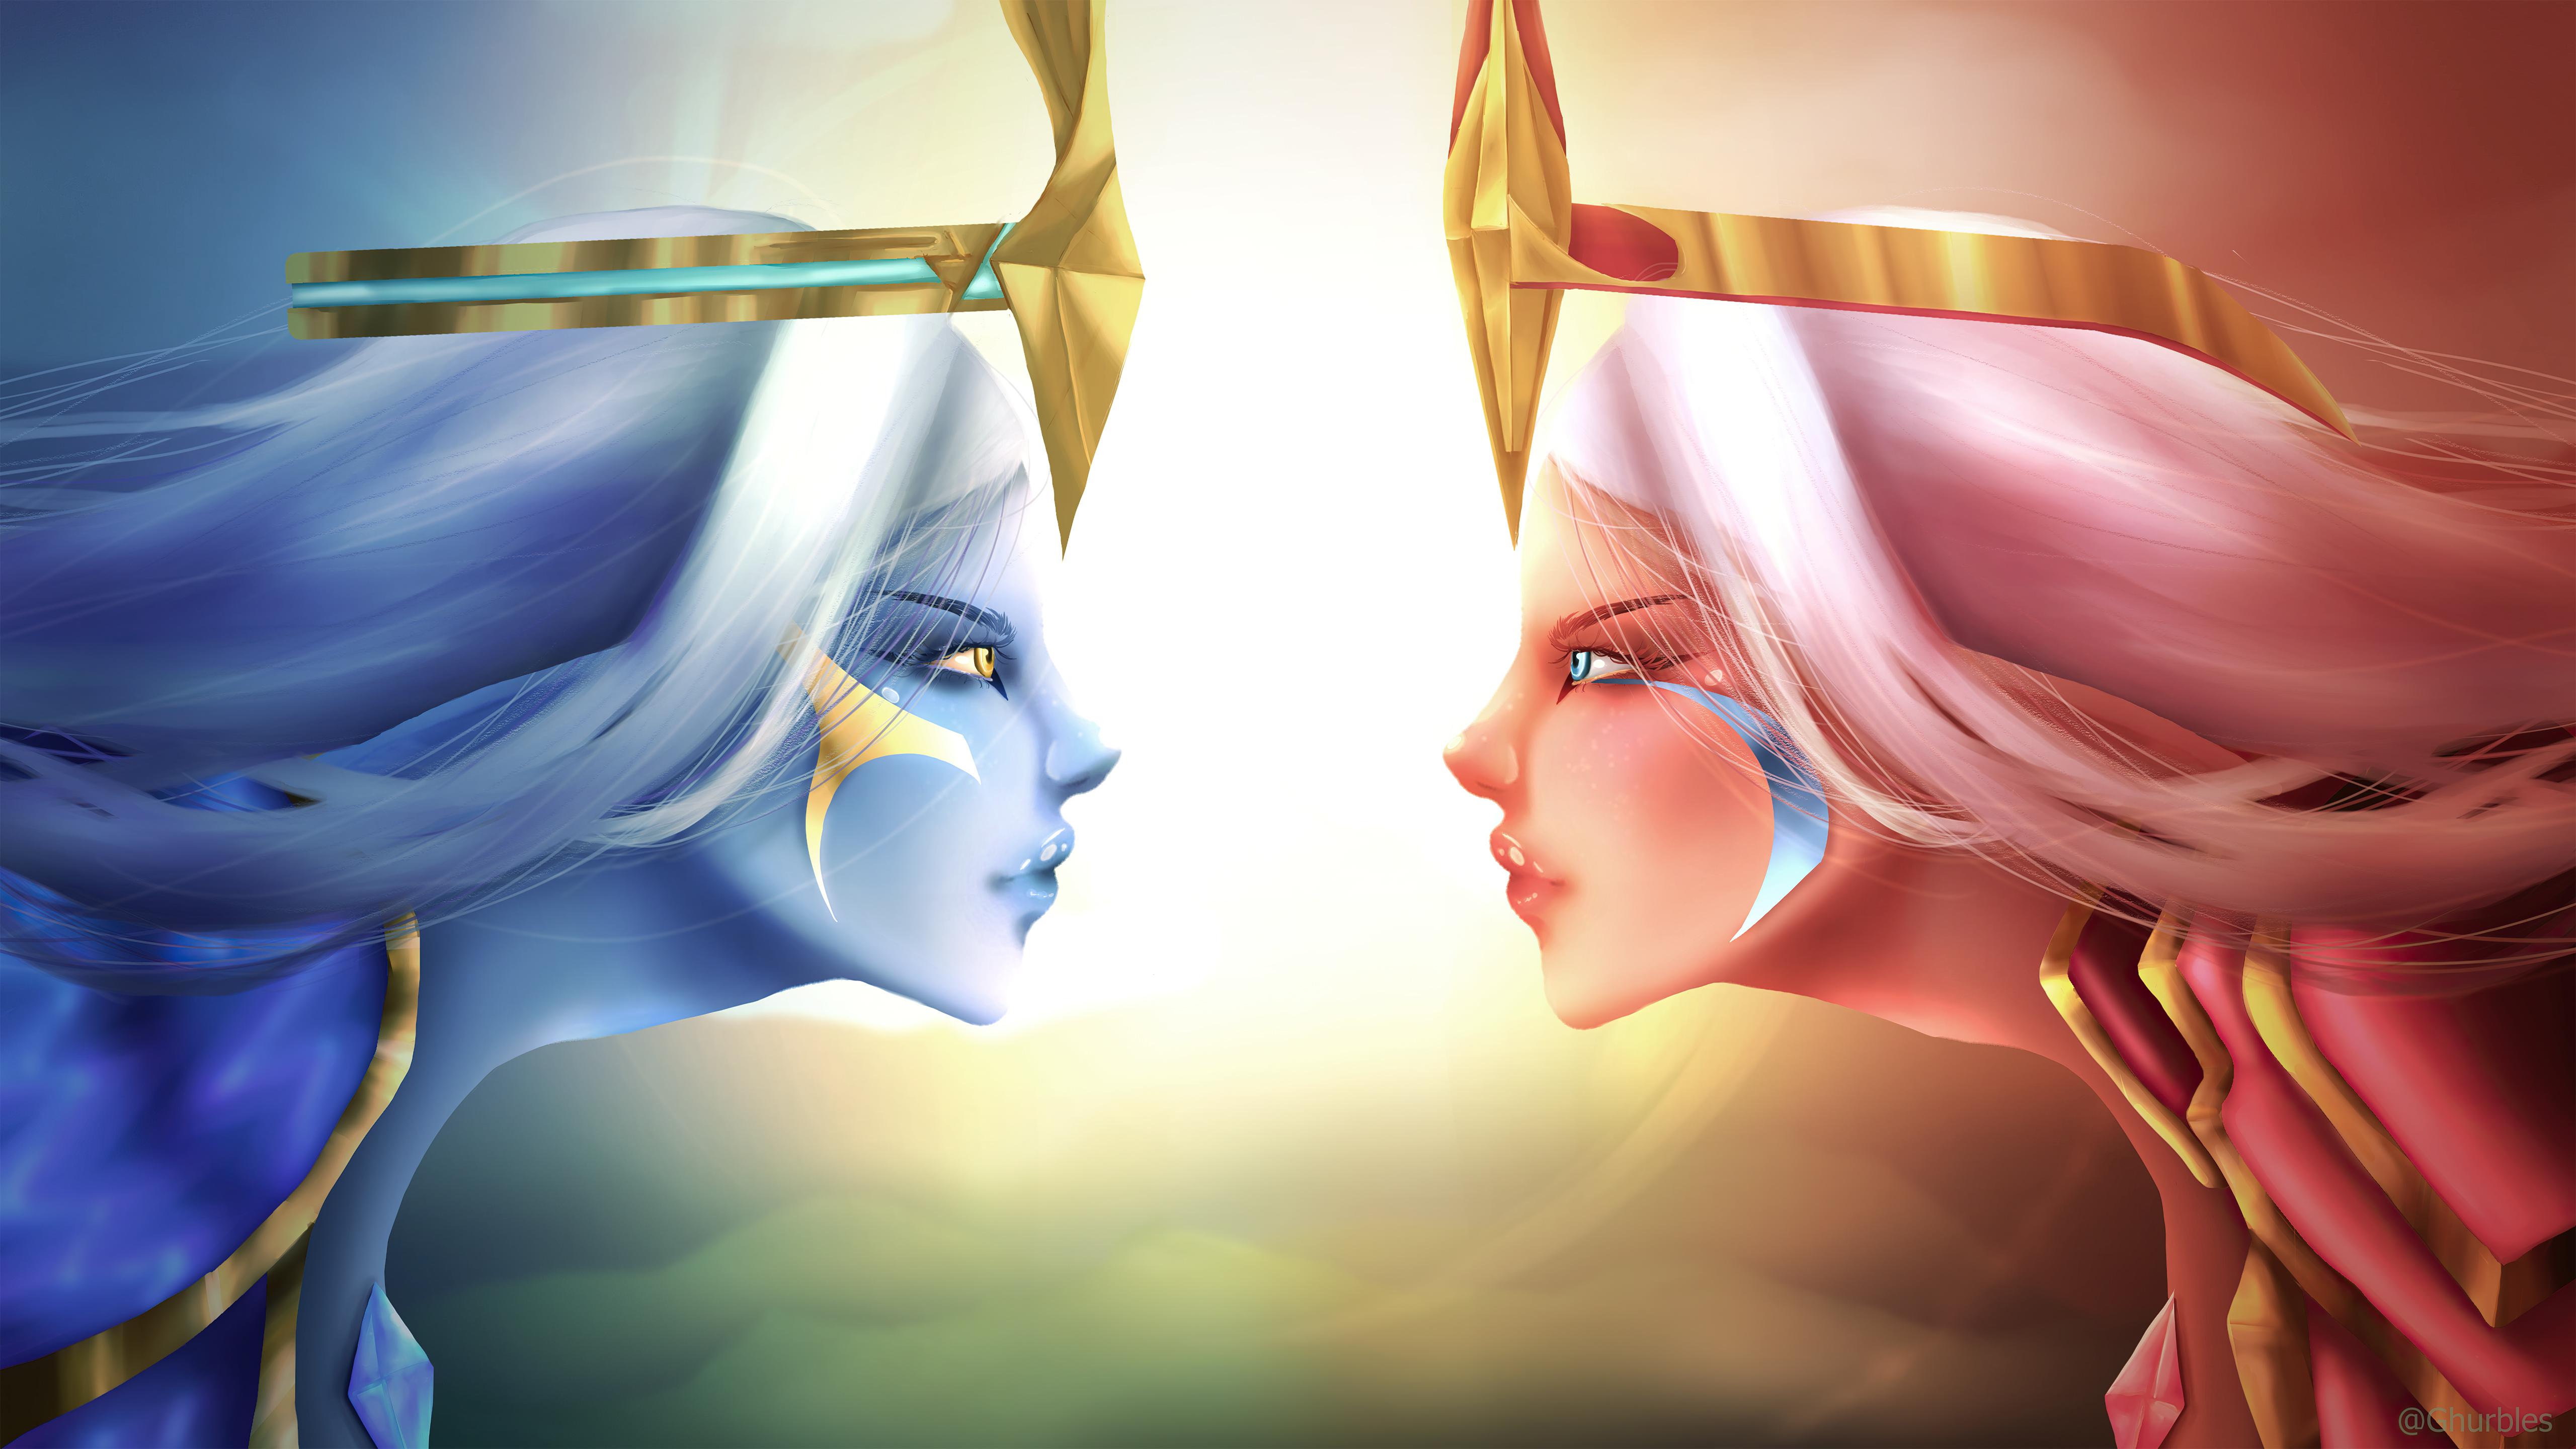 Wallpaper Dawnbringer vs Duskbringer Soraka League of Legends